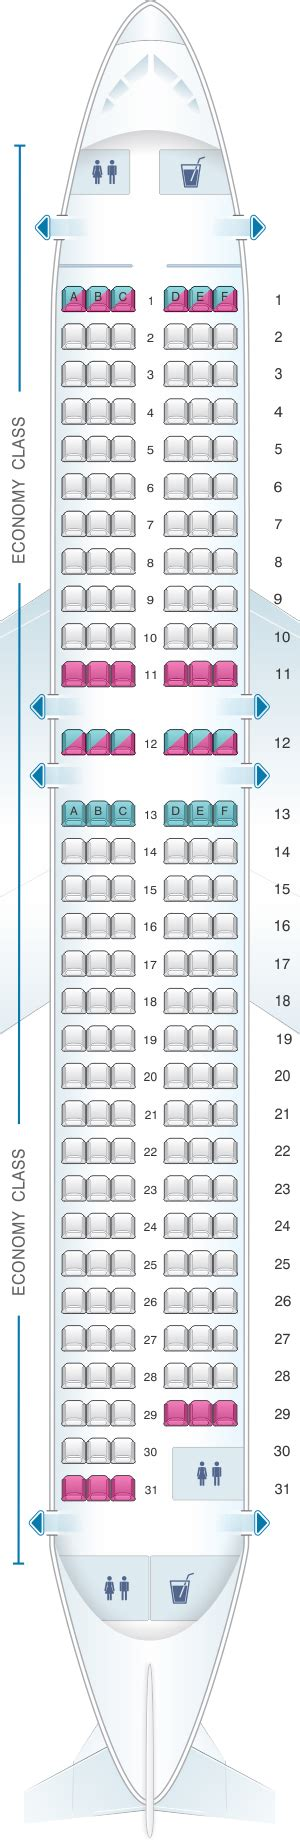 plan siege avion easyjet seat map easyjet airbus a320 seatmaestro